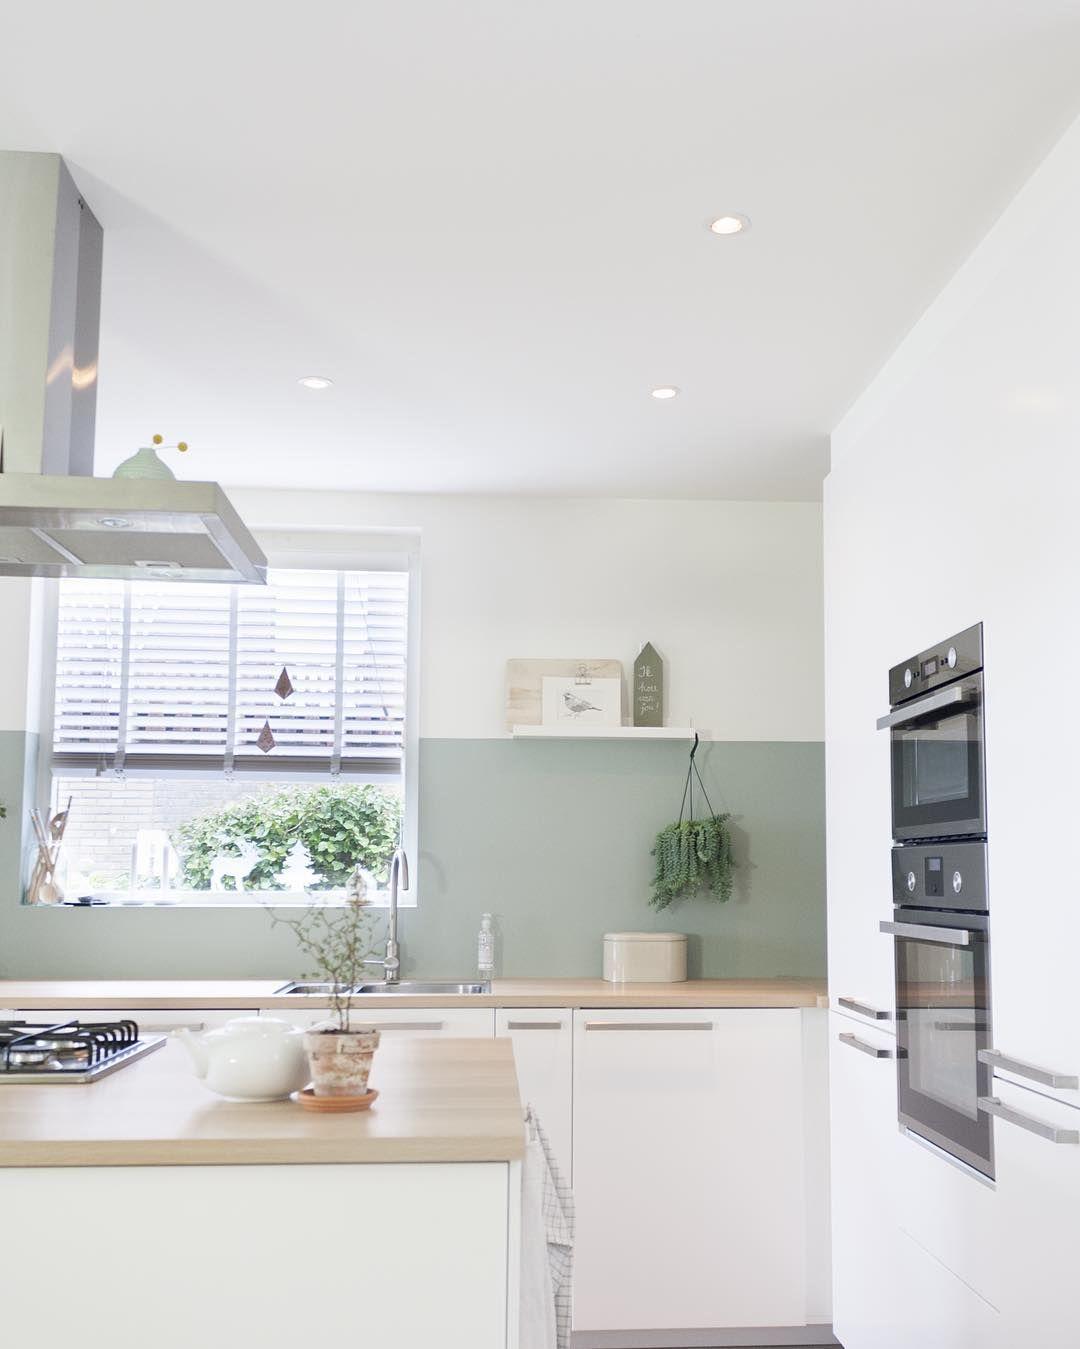 Küche mit grüner Wand   Küche skandinavisch   Pinterest   grüne ...